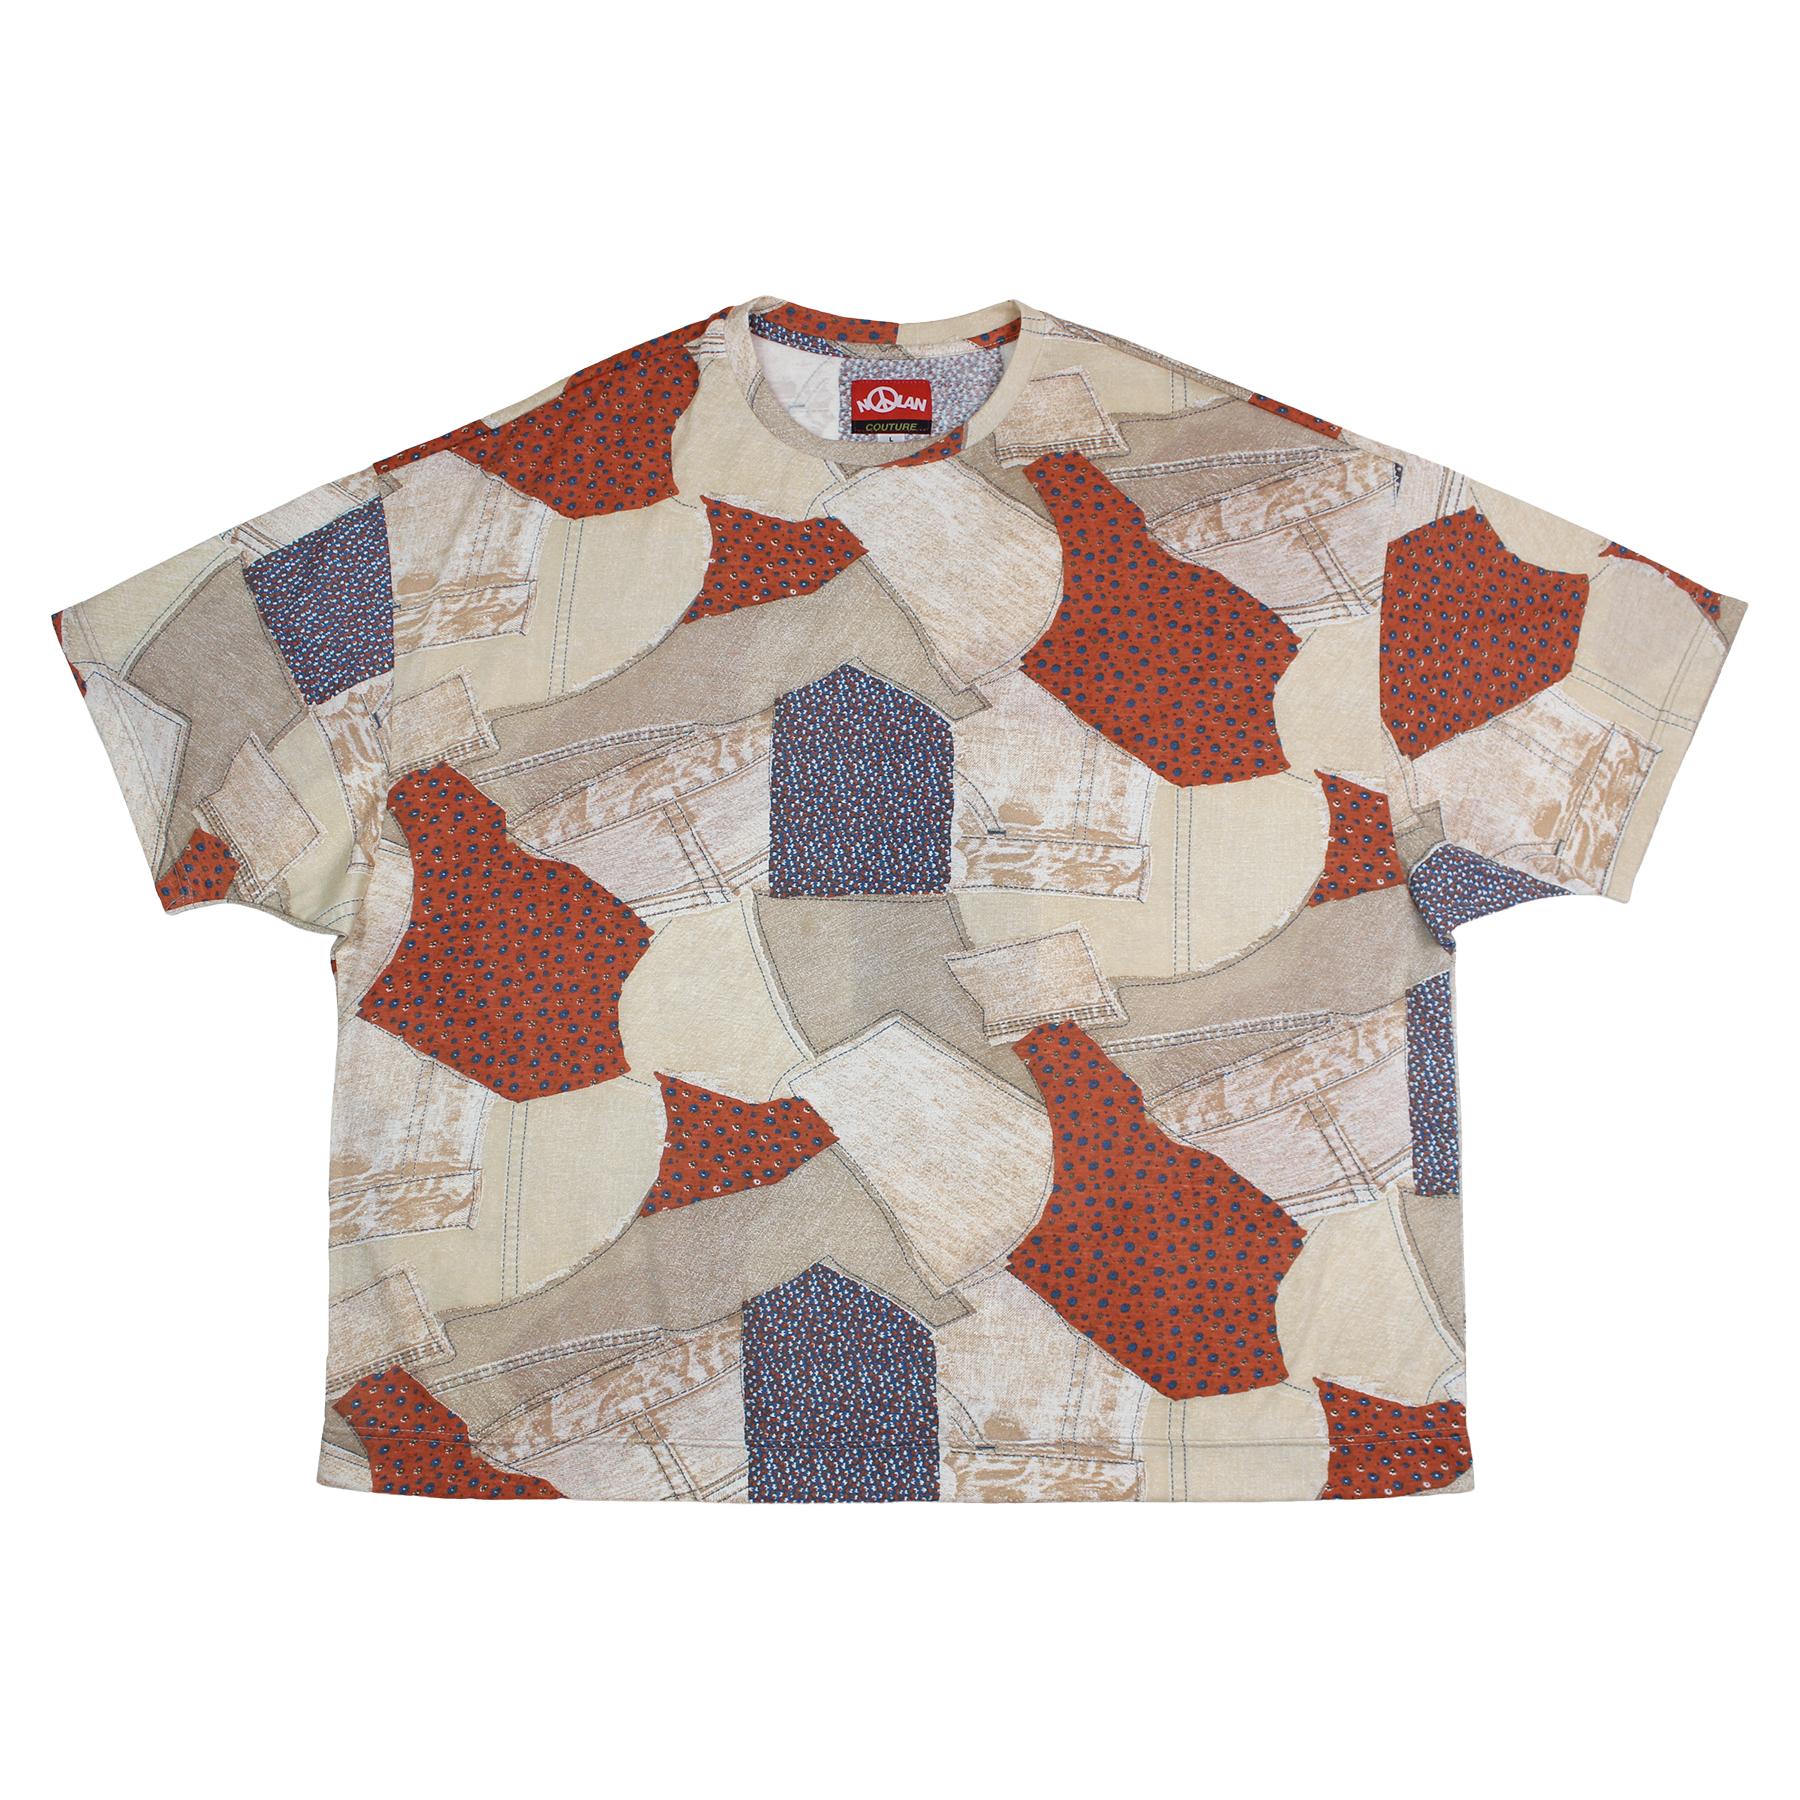 Nolan Couture Pattern T-shirt front.jpg